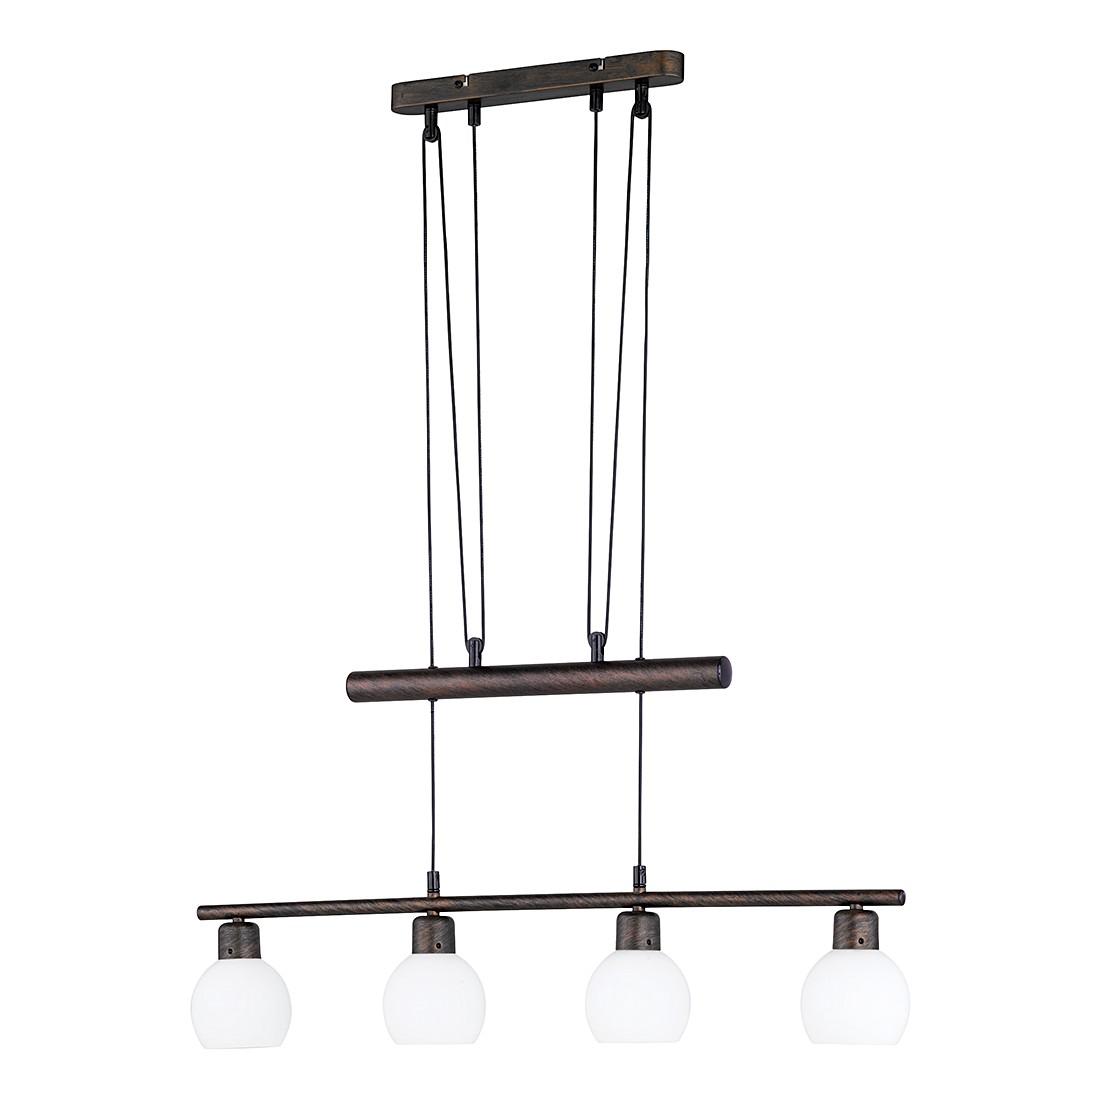 energie  A++, LED- JoJo-hanglamp - antiek roestkleurig 4x4W, Trio